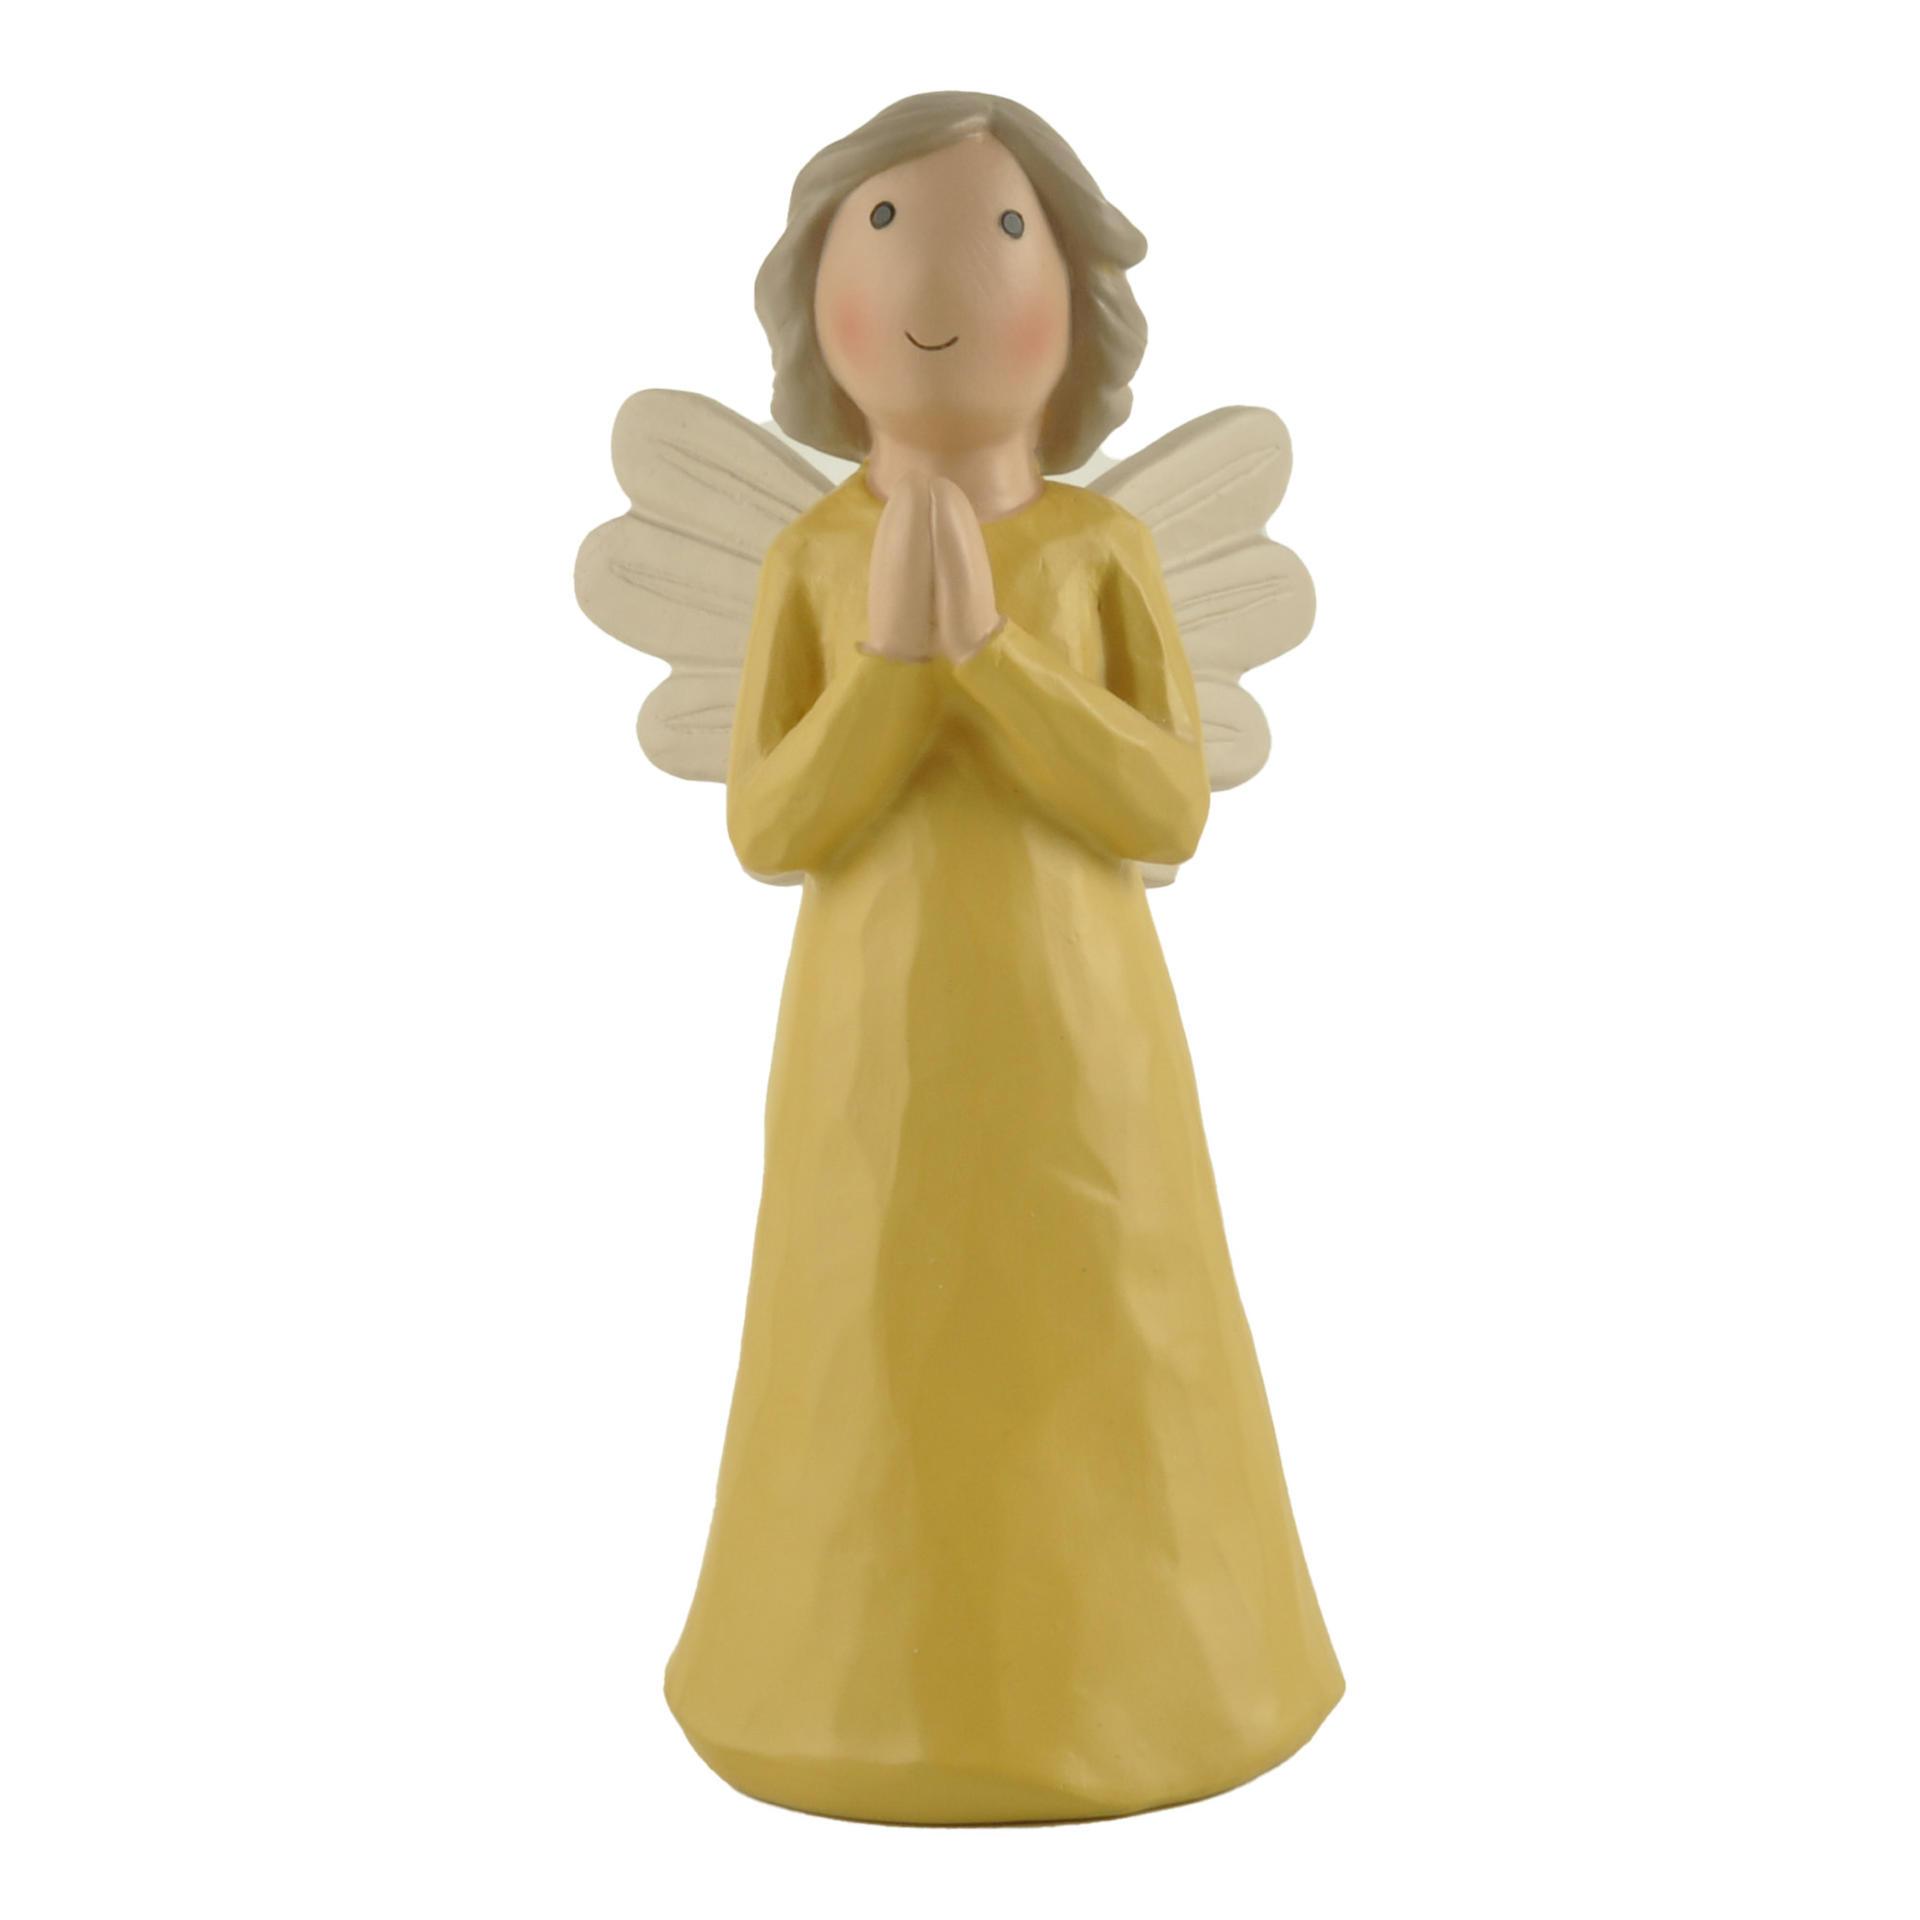 New Design Cute Resin Prayer Angel in Yellow Dress PH 15187